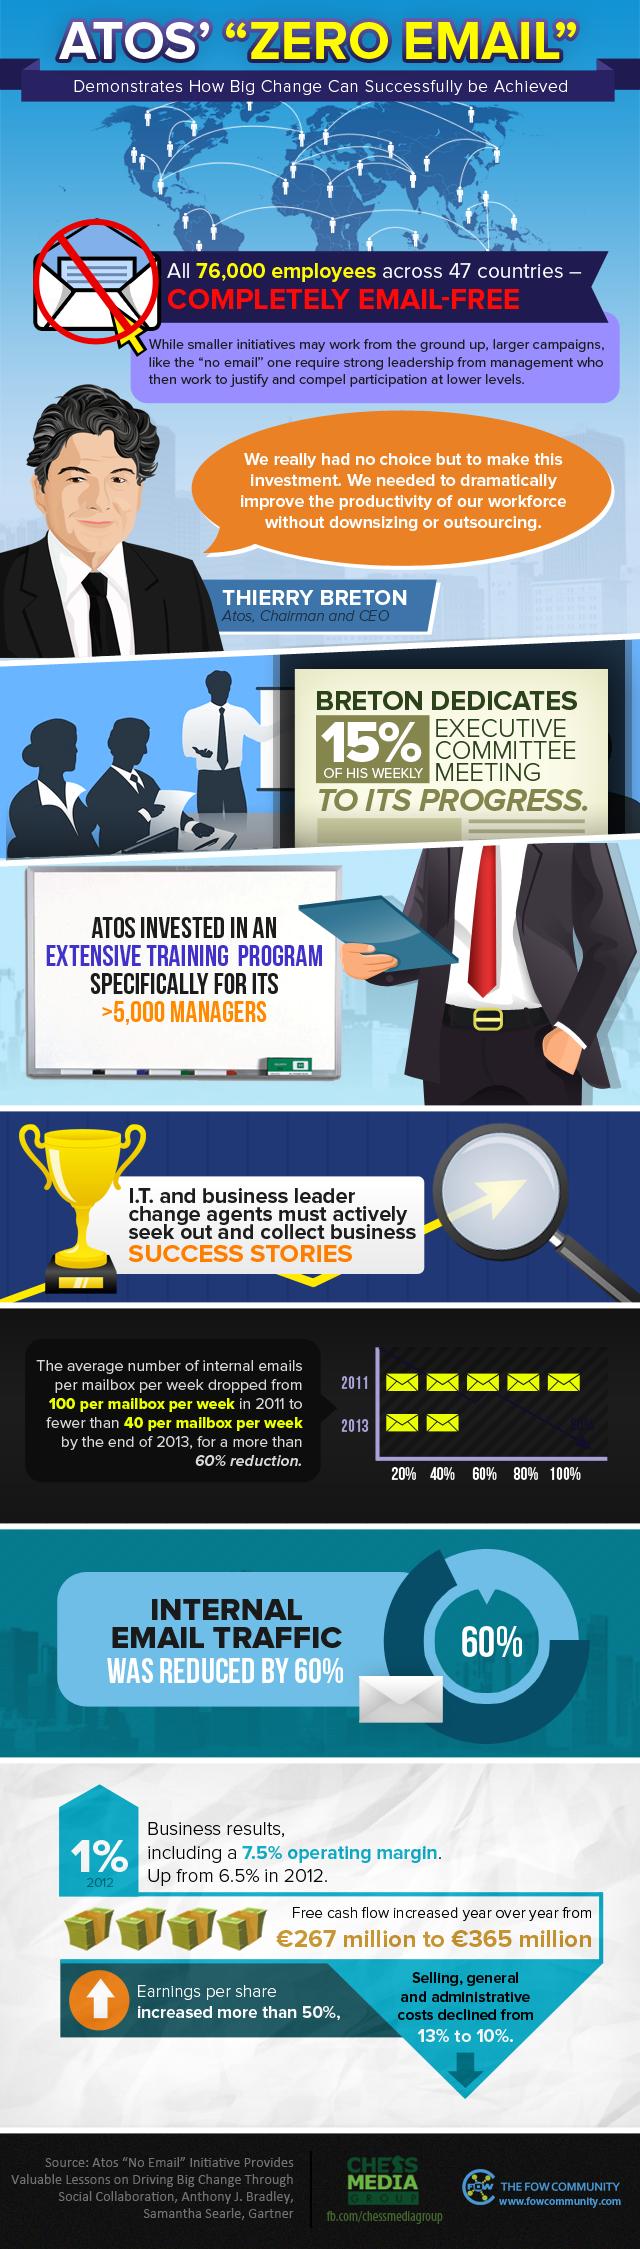 Atos-Infographic02(09-24-13)